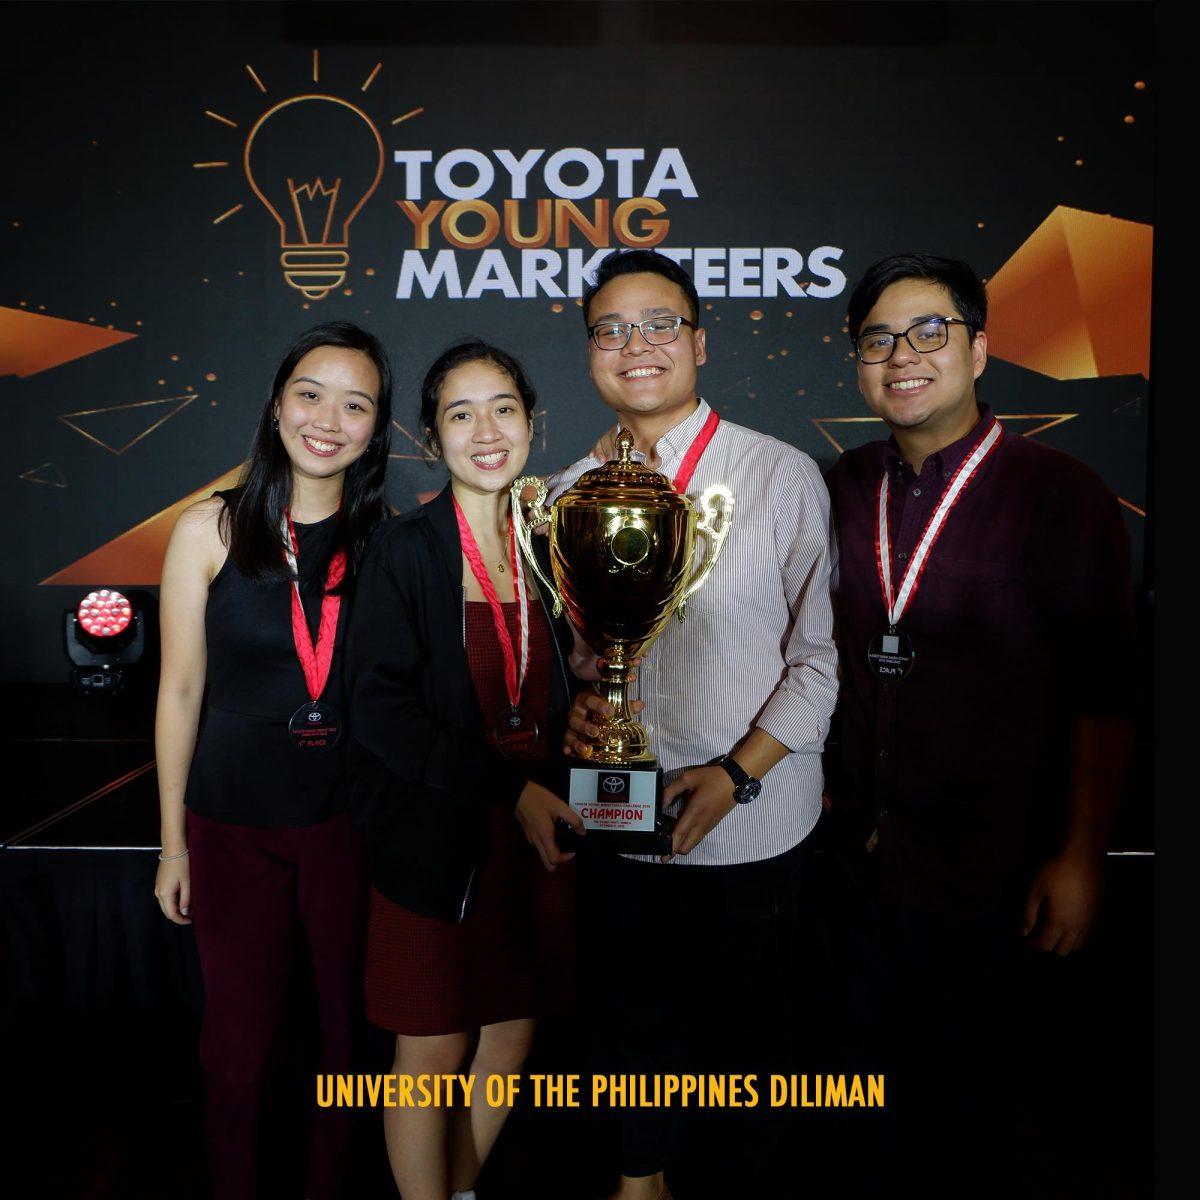 Toyota Young Marketeers Challenge